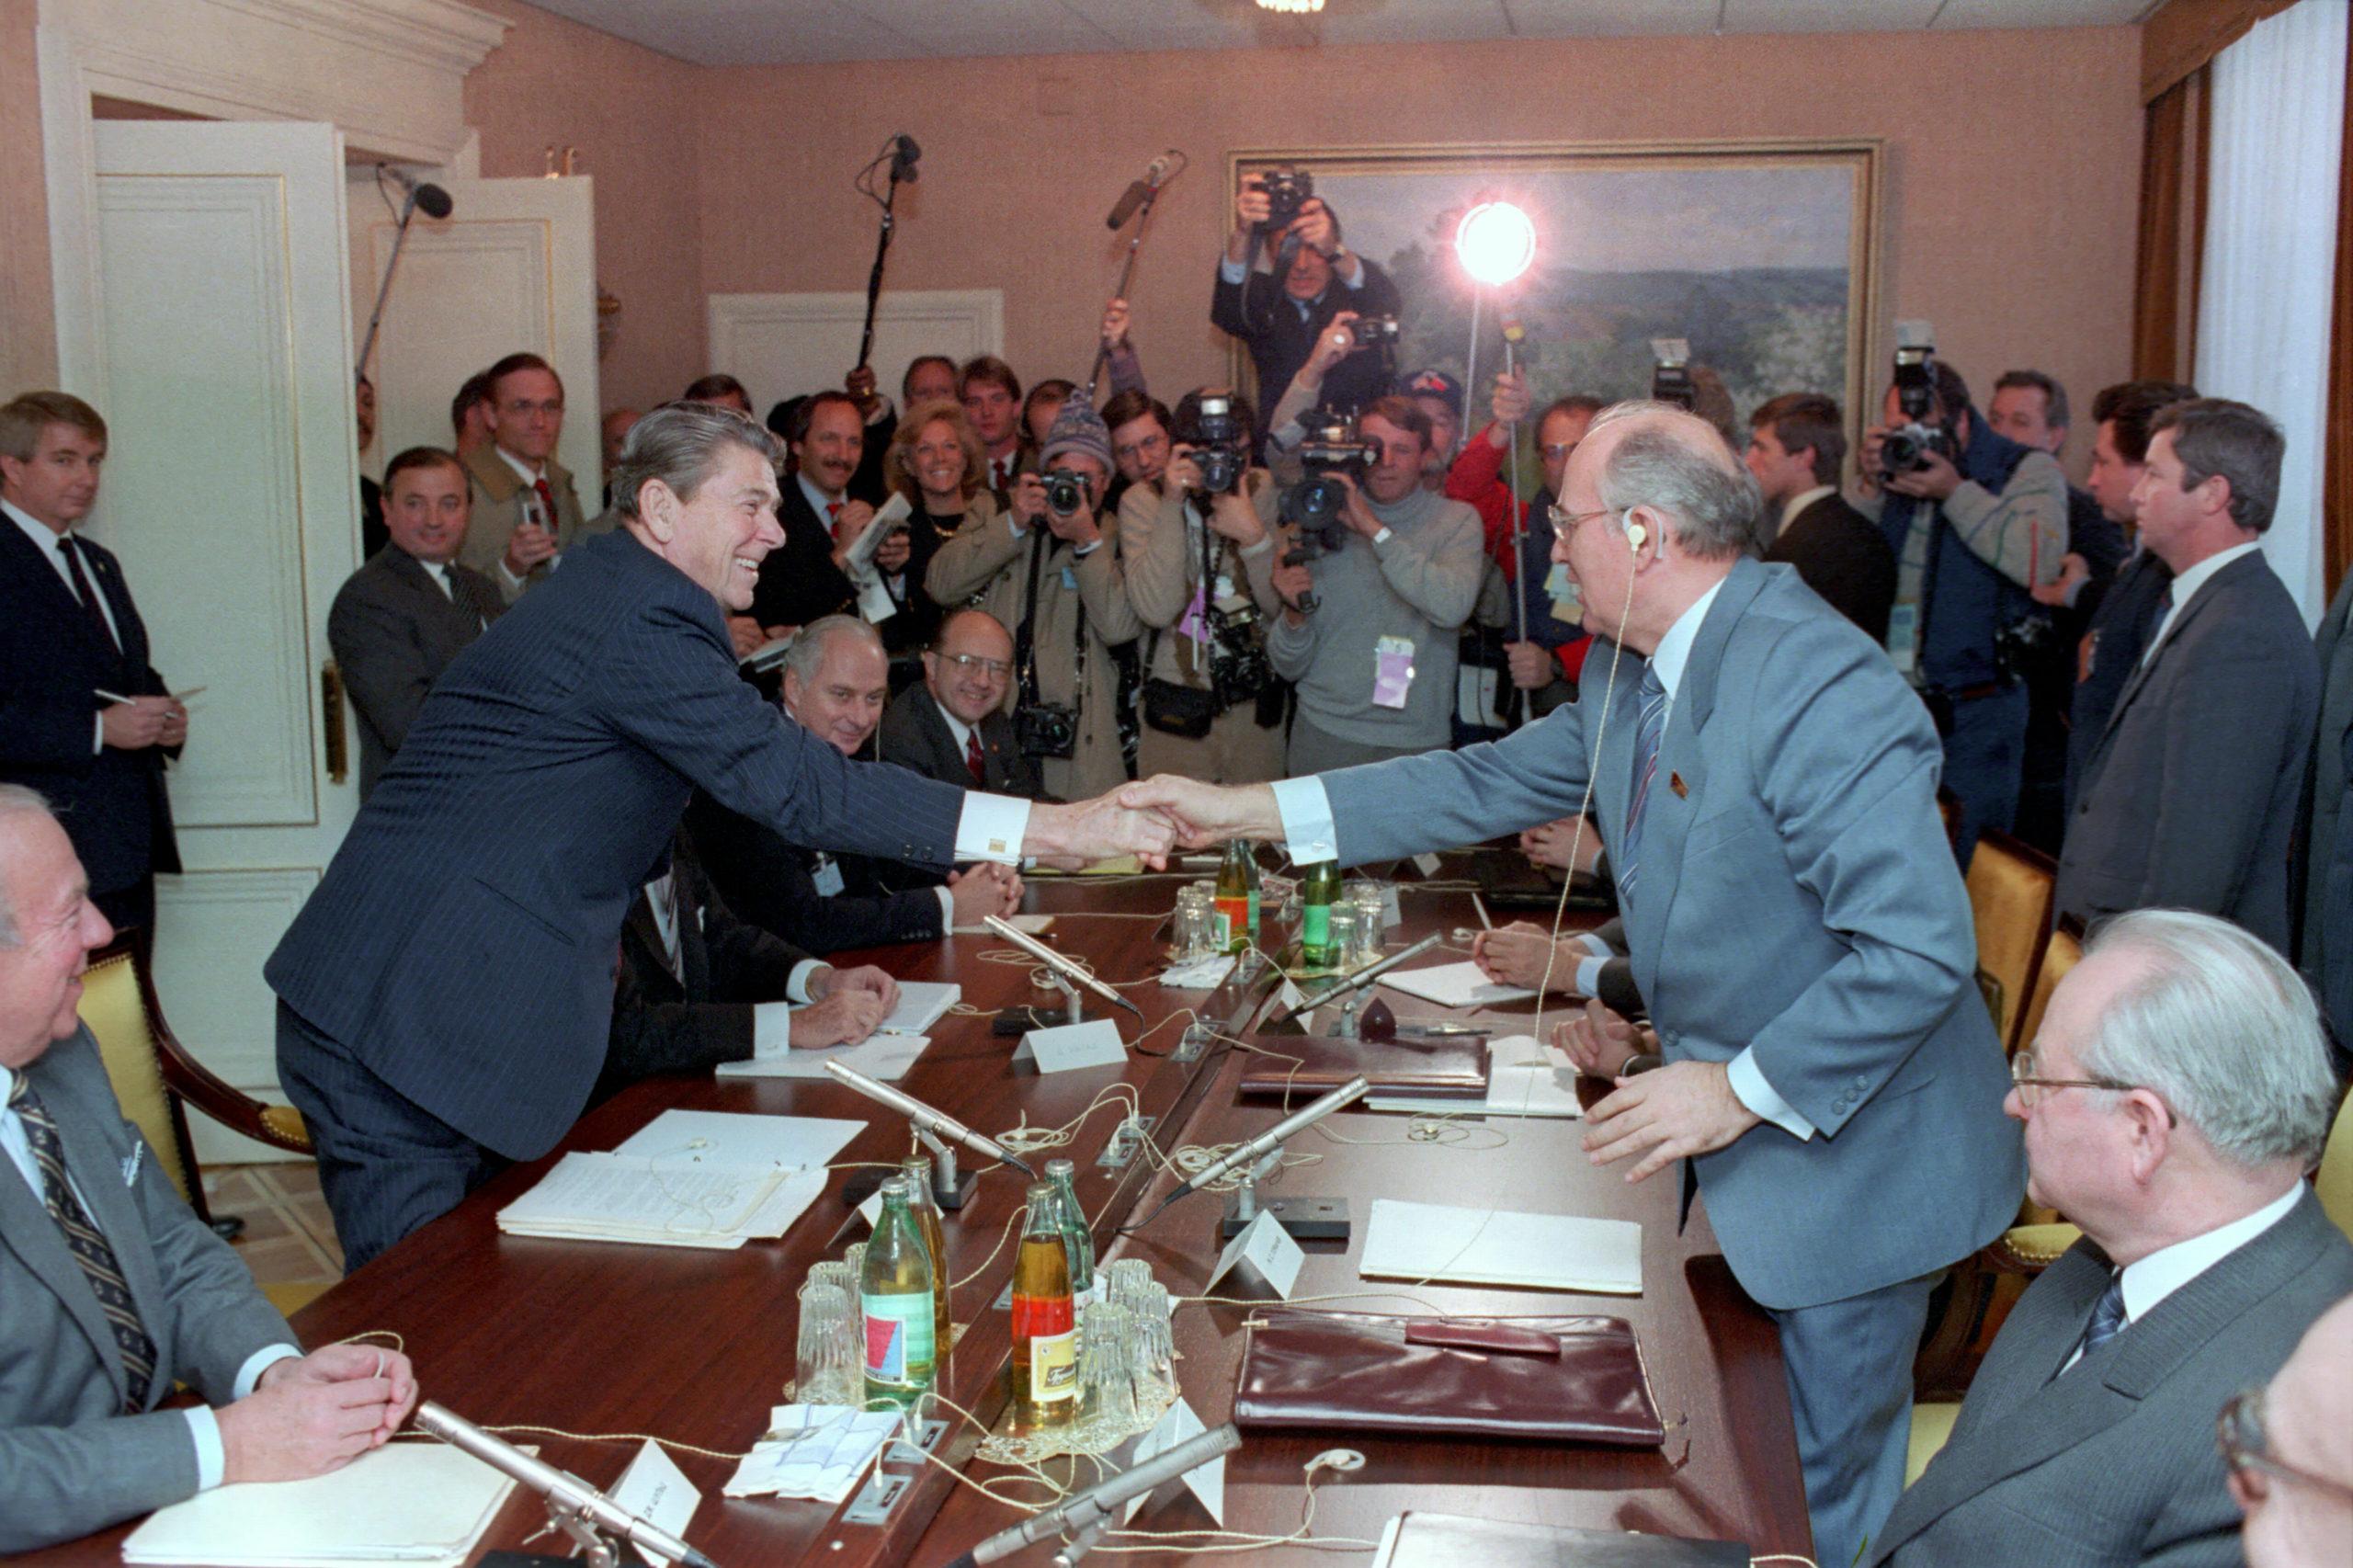 Handshake, a memory of pre-COVID diplomacy. President Ronald Reagan at a Plenary Meeting with Soviet General Secretary Gorbachev at The Soviet Mission During The Geneva Summit, November 1985.